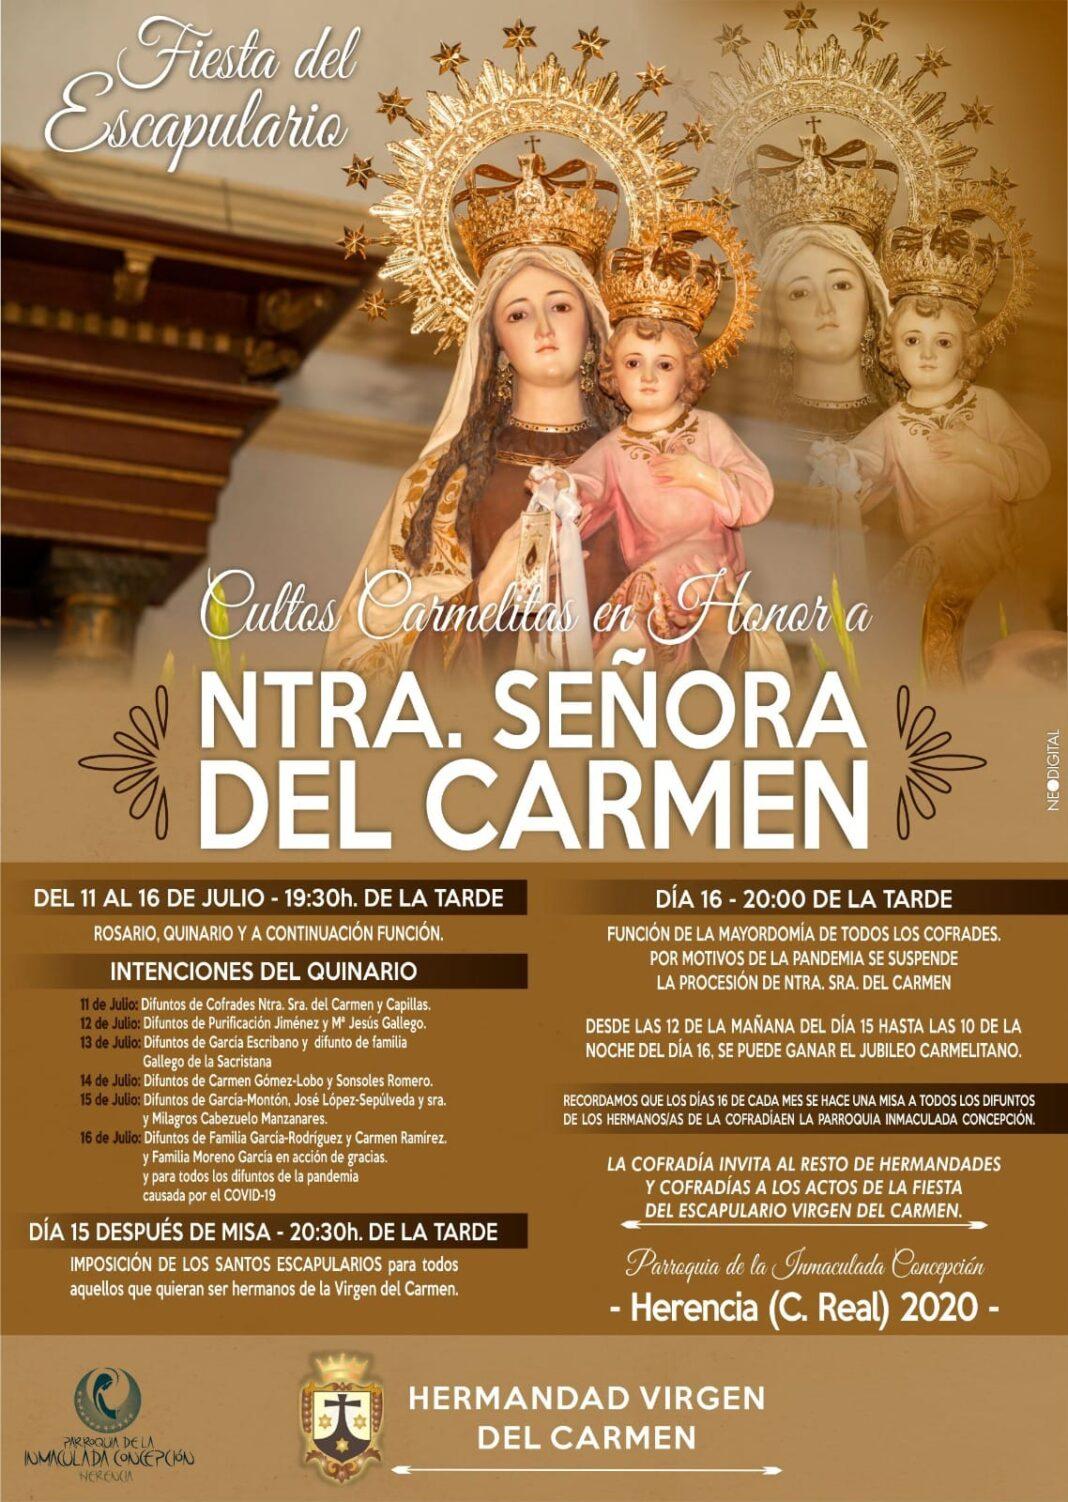 festividad de nuestra señora del carmen 1068x1502 - Actos religiosos de la festividad de Nuestra Señora del Carmen